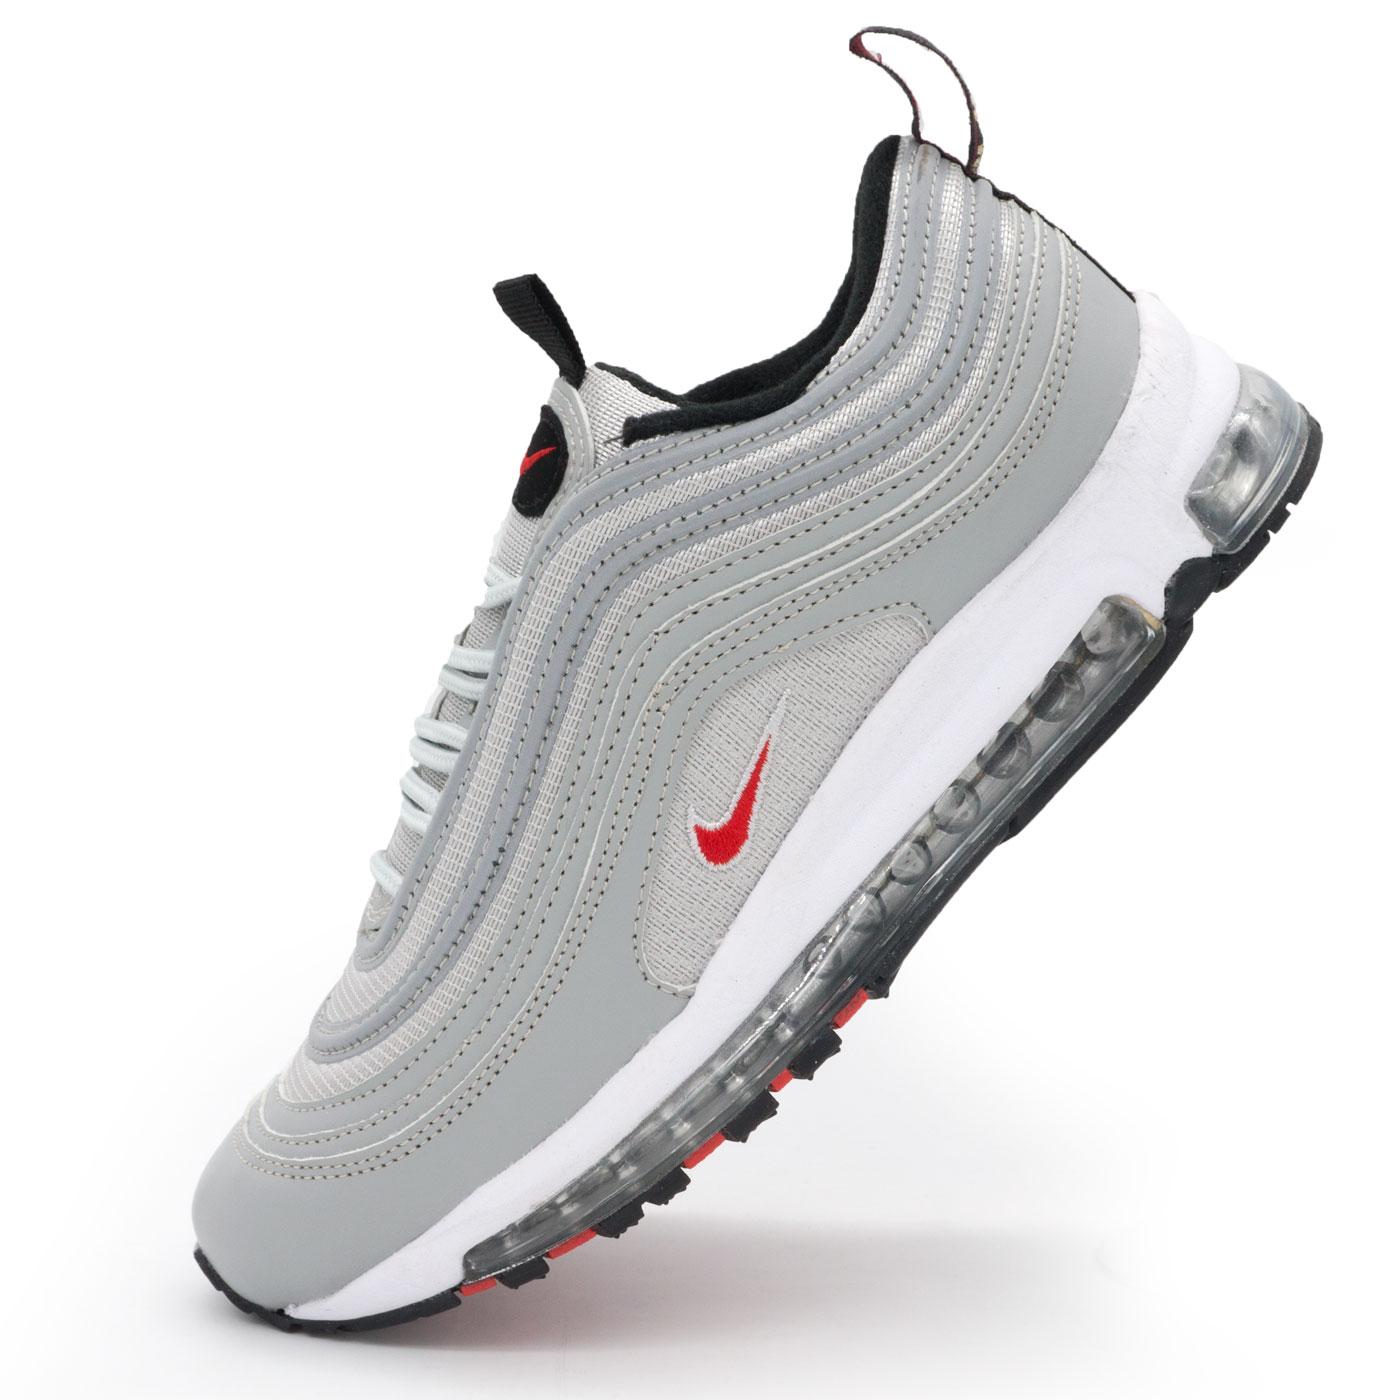 280045b0 ... фото main Мужские и женские кроссовки Nike air max 97 серебристые  Vietnam main ...